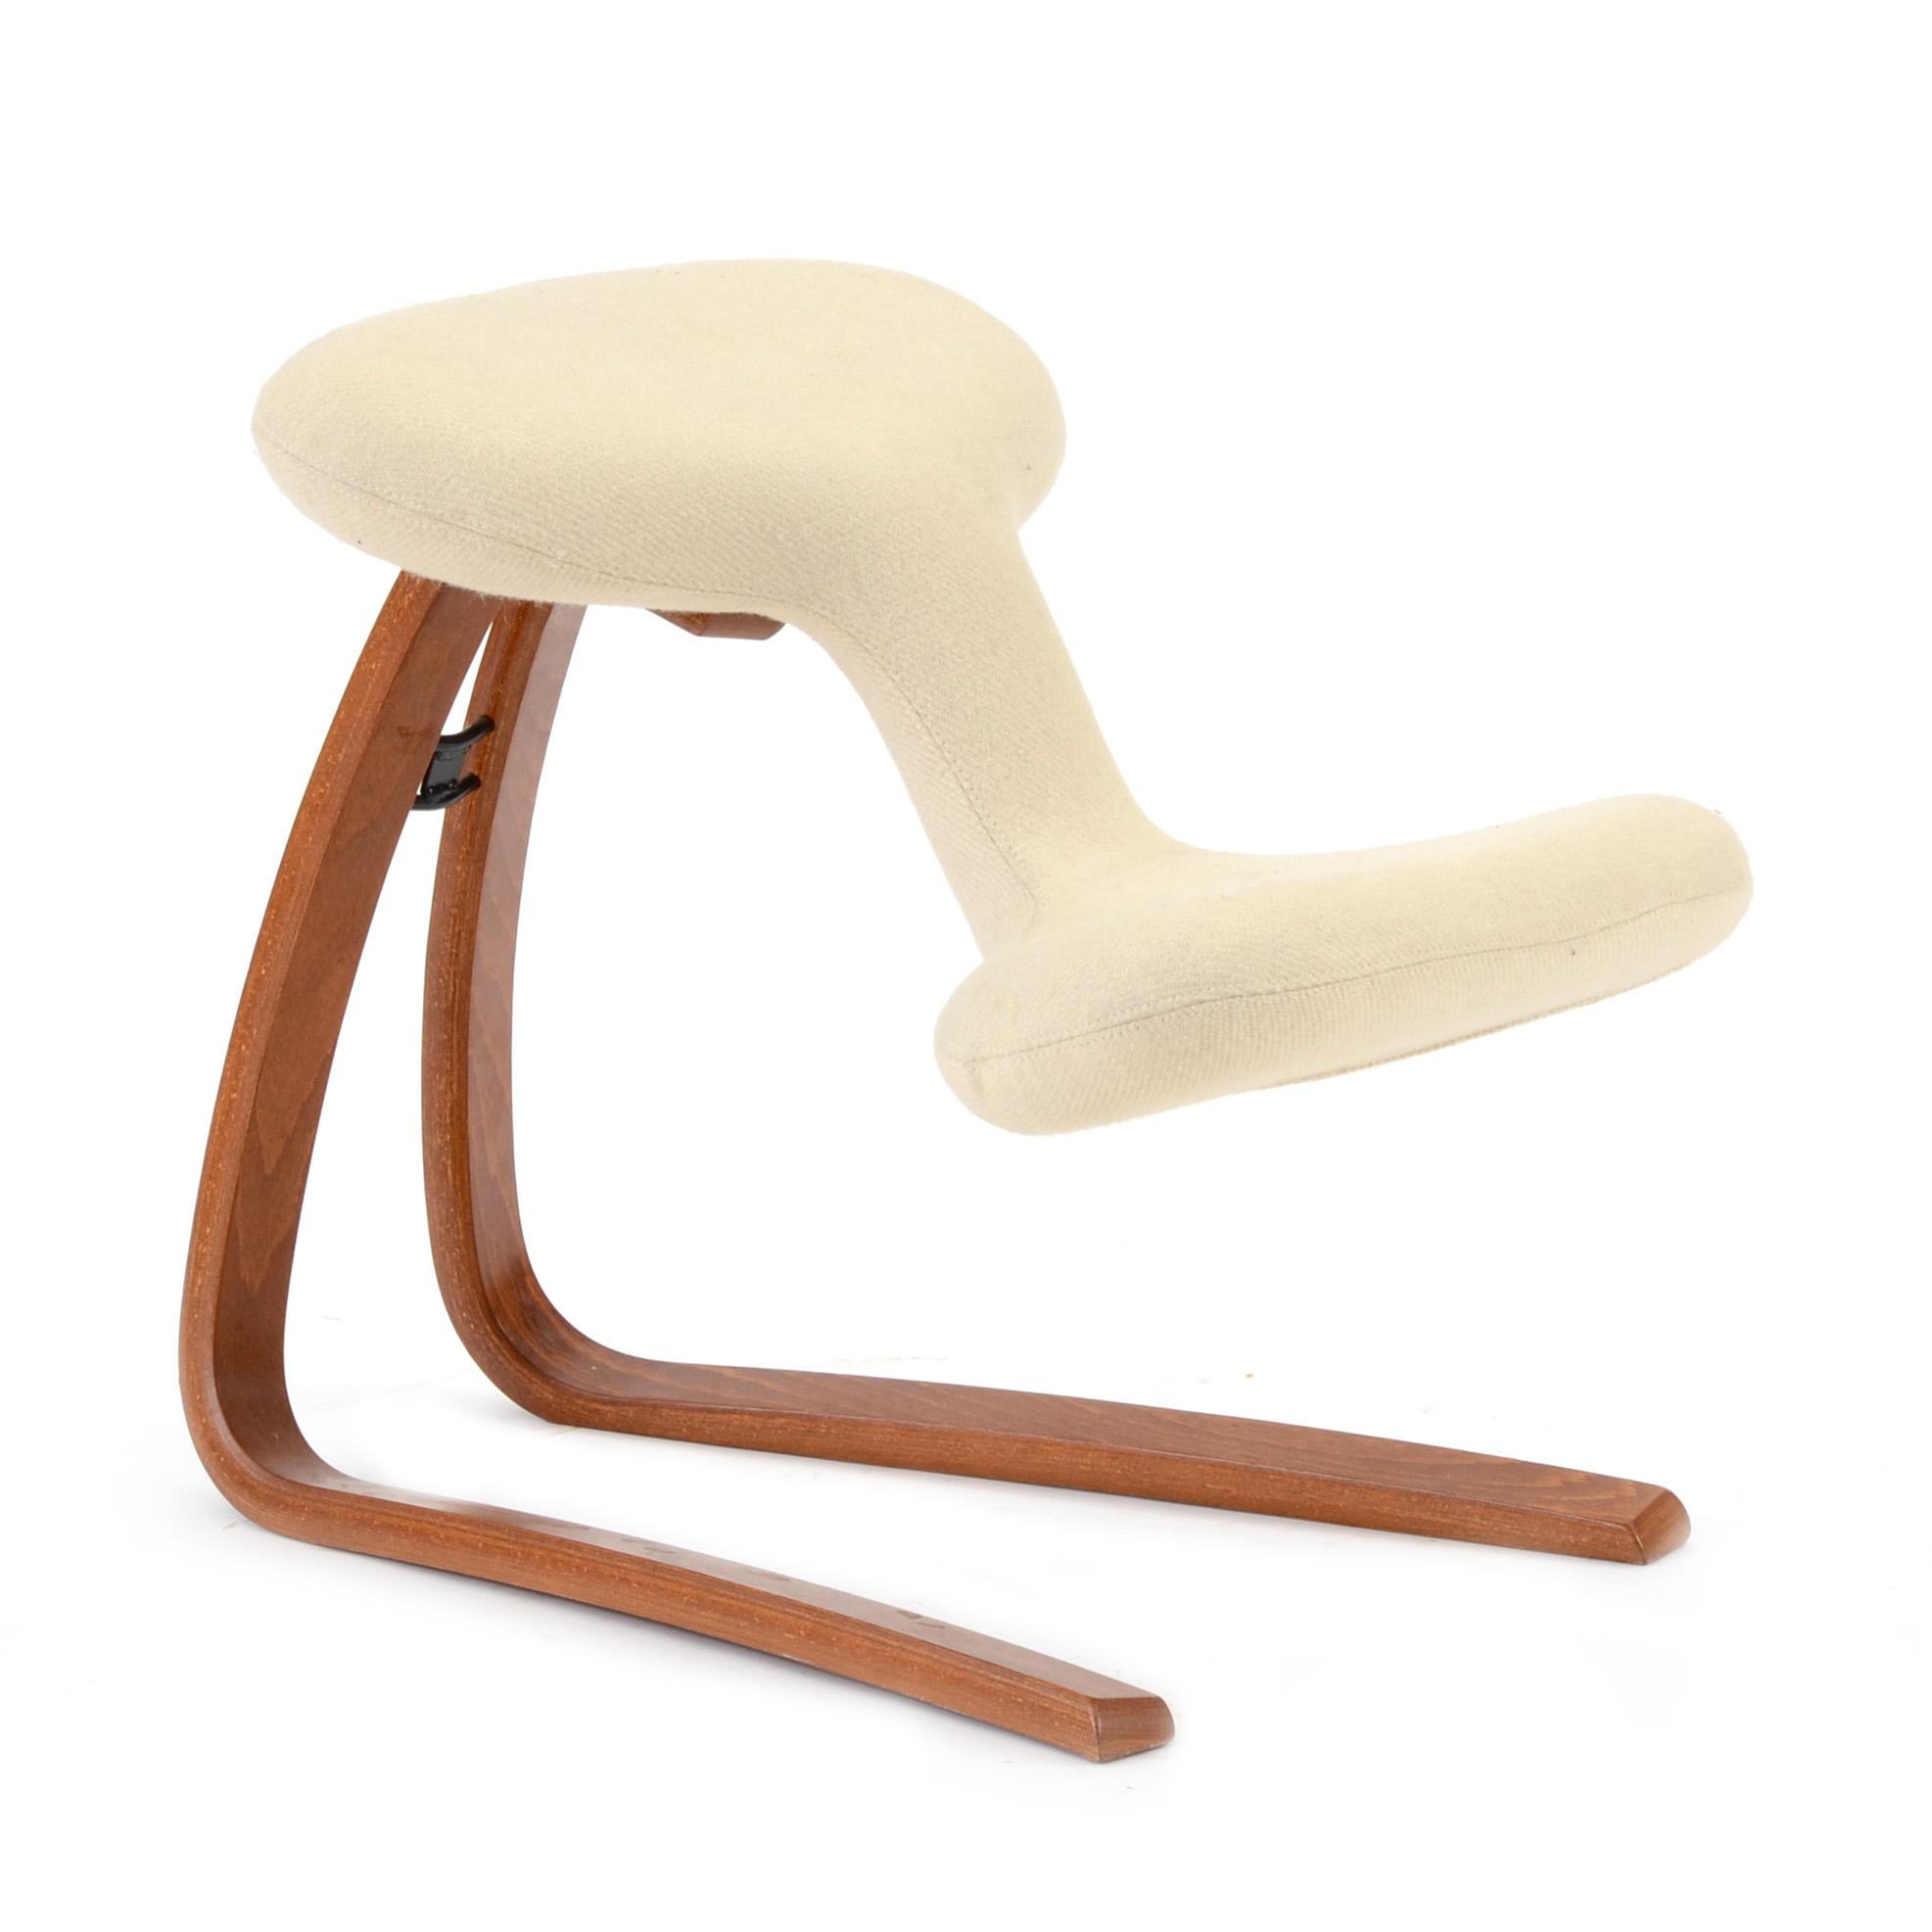 ergonomic chair norway comfortable bean bag chairs oddvin rykken balans ebth